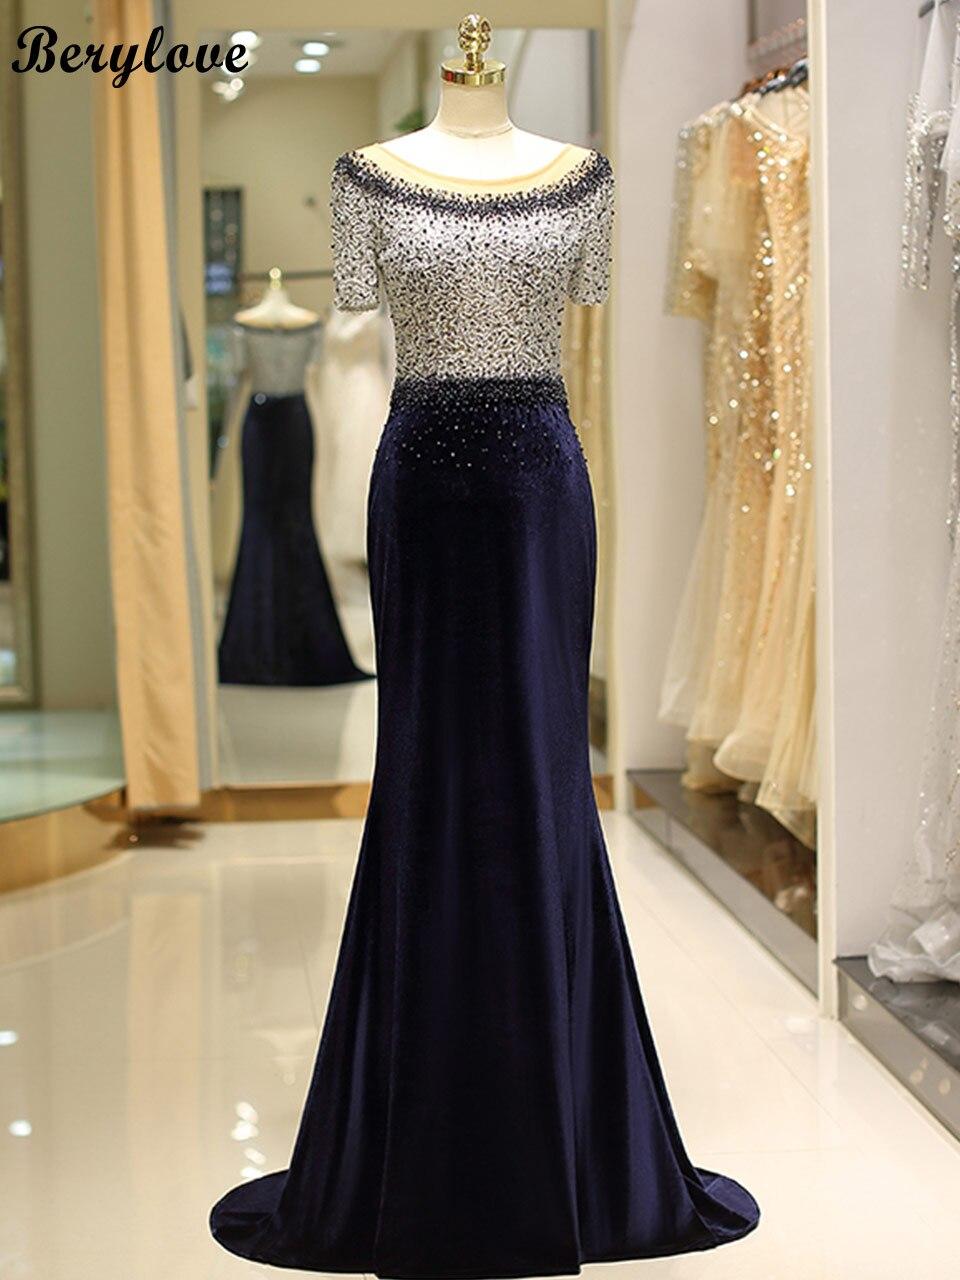 229d7902de US $274.99 |Aliexpress.com : Buy BeryLove 2018 Navy Blue Velvet Mermaid  Evening Dress With Sleeves Long Beaded Lace Evening Gowns Formal Dress  Women ...